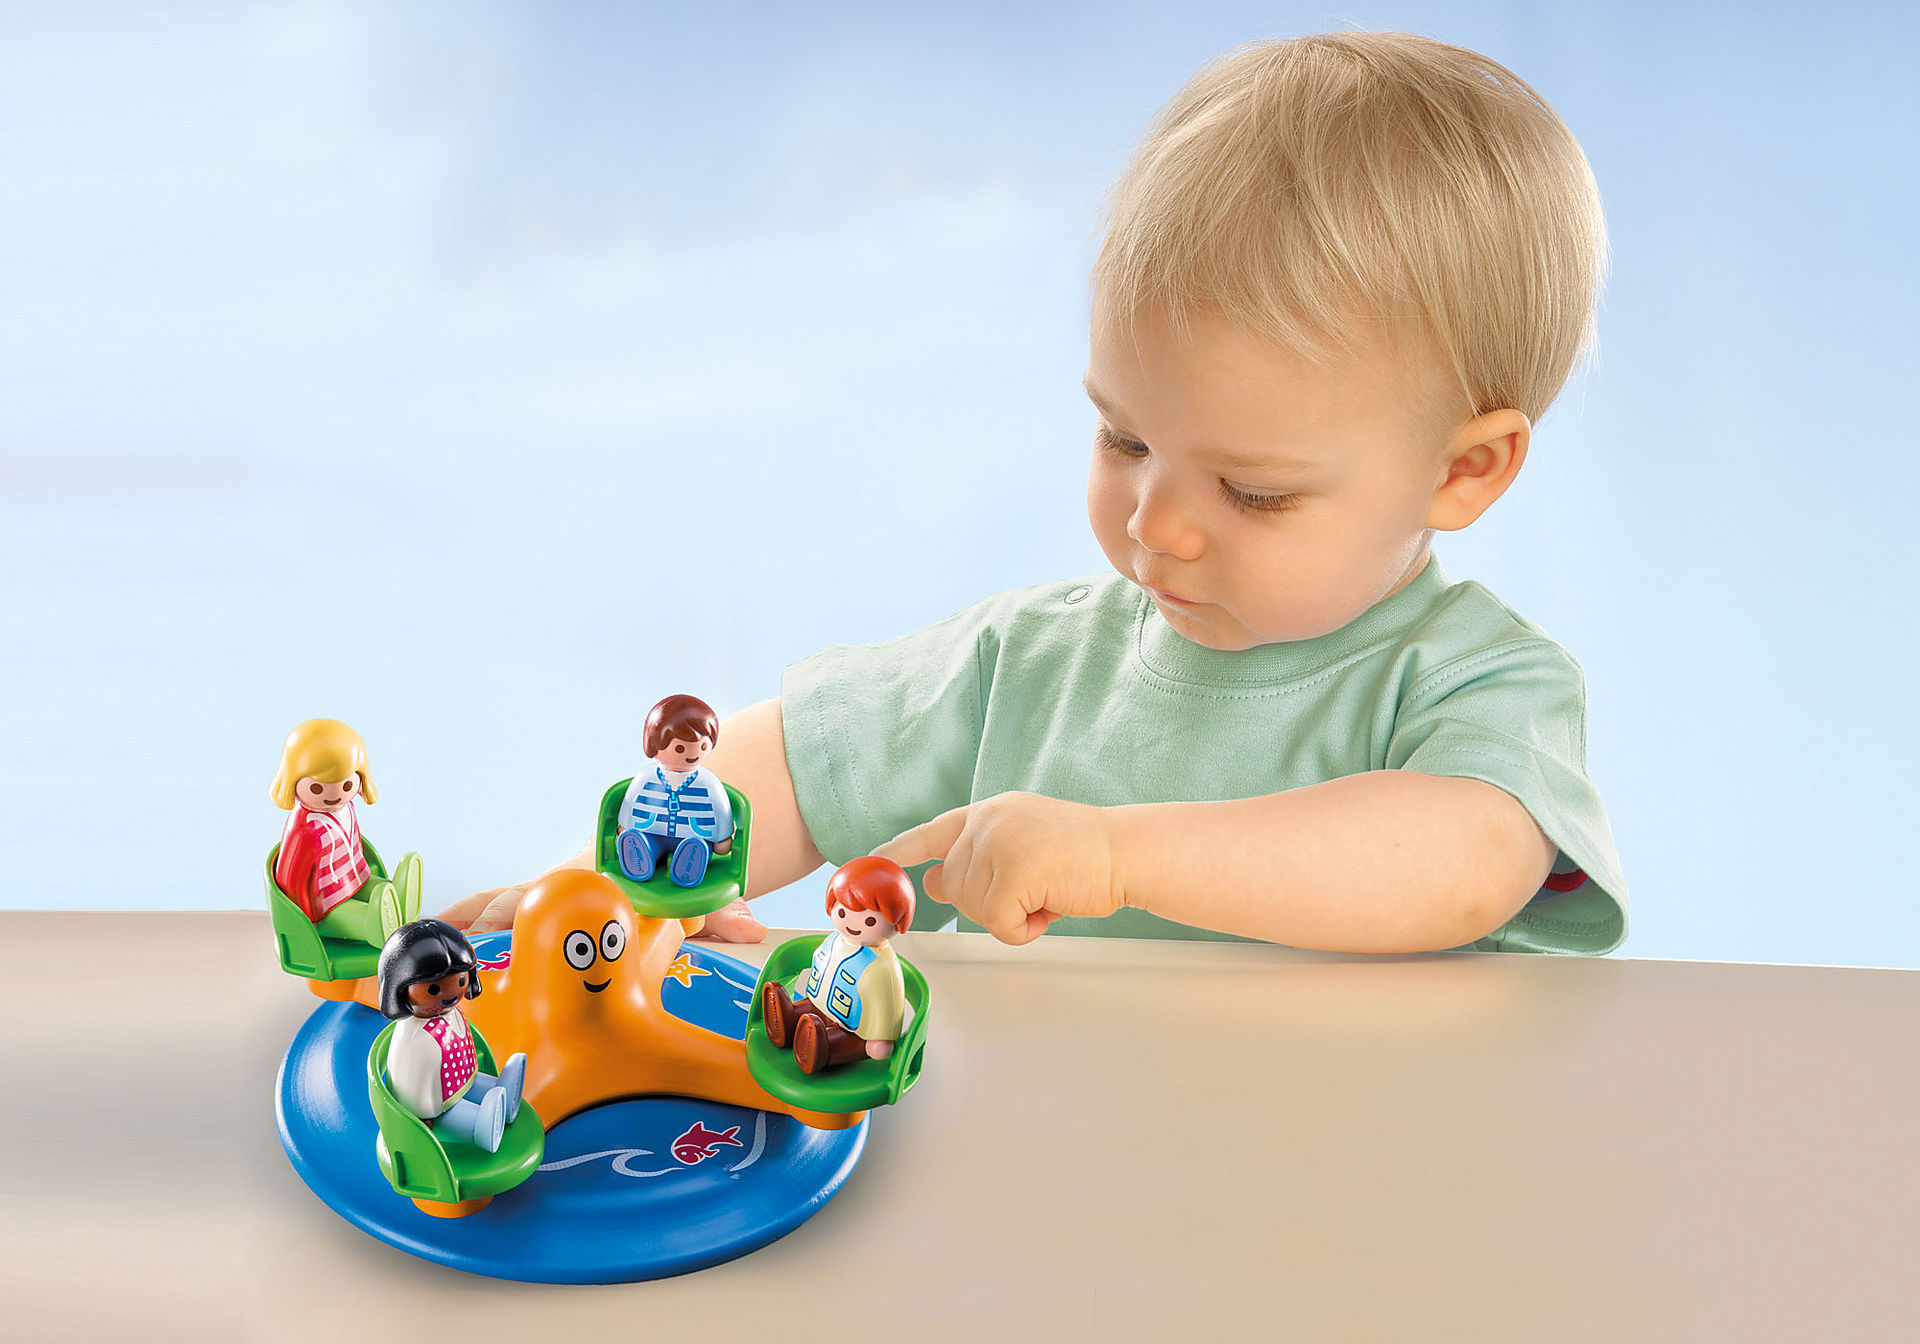 http://media.playmobil.com/i/playmobil/9379_product_extra1/Παιδικό καρουζέλ